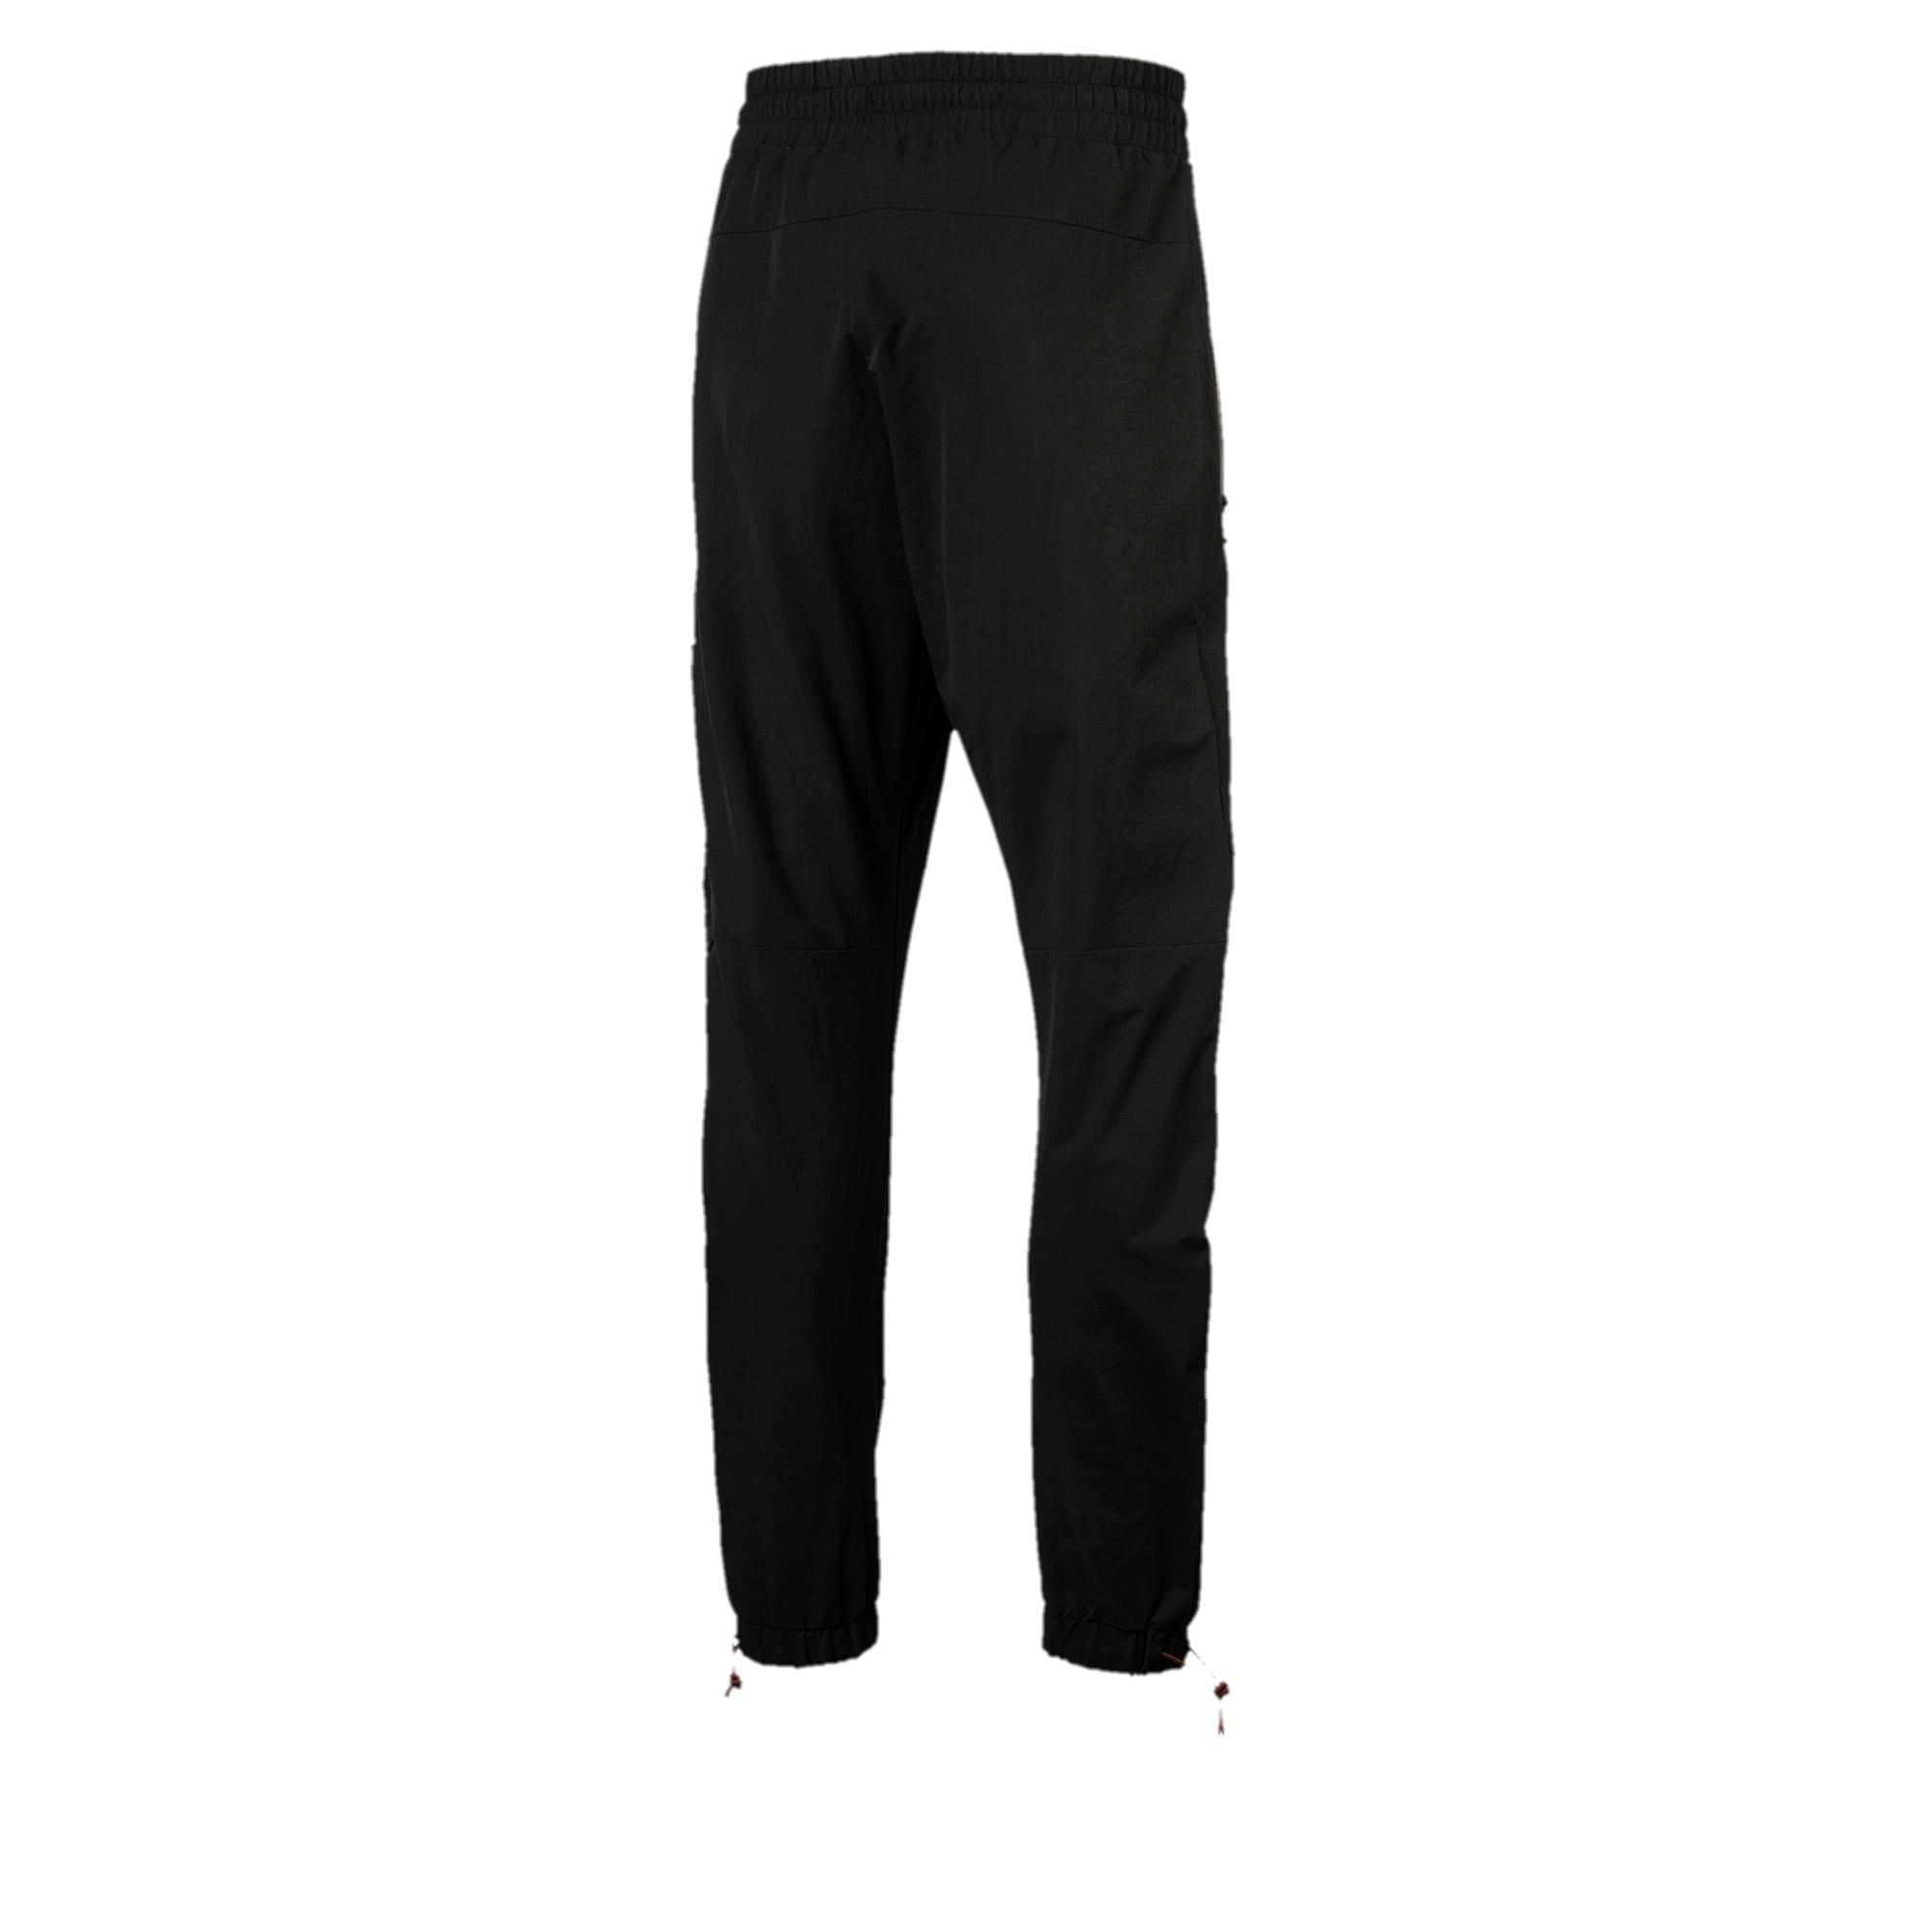 Thumbnail 2 of Ferrari SFXX Lifestyle Men's Woven Pants, Puma Black, medium-IND